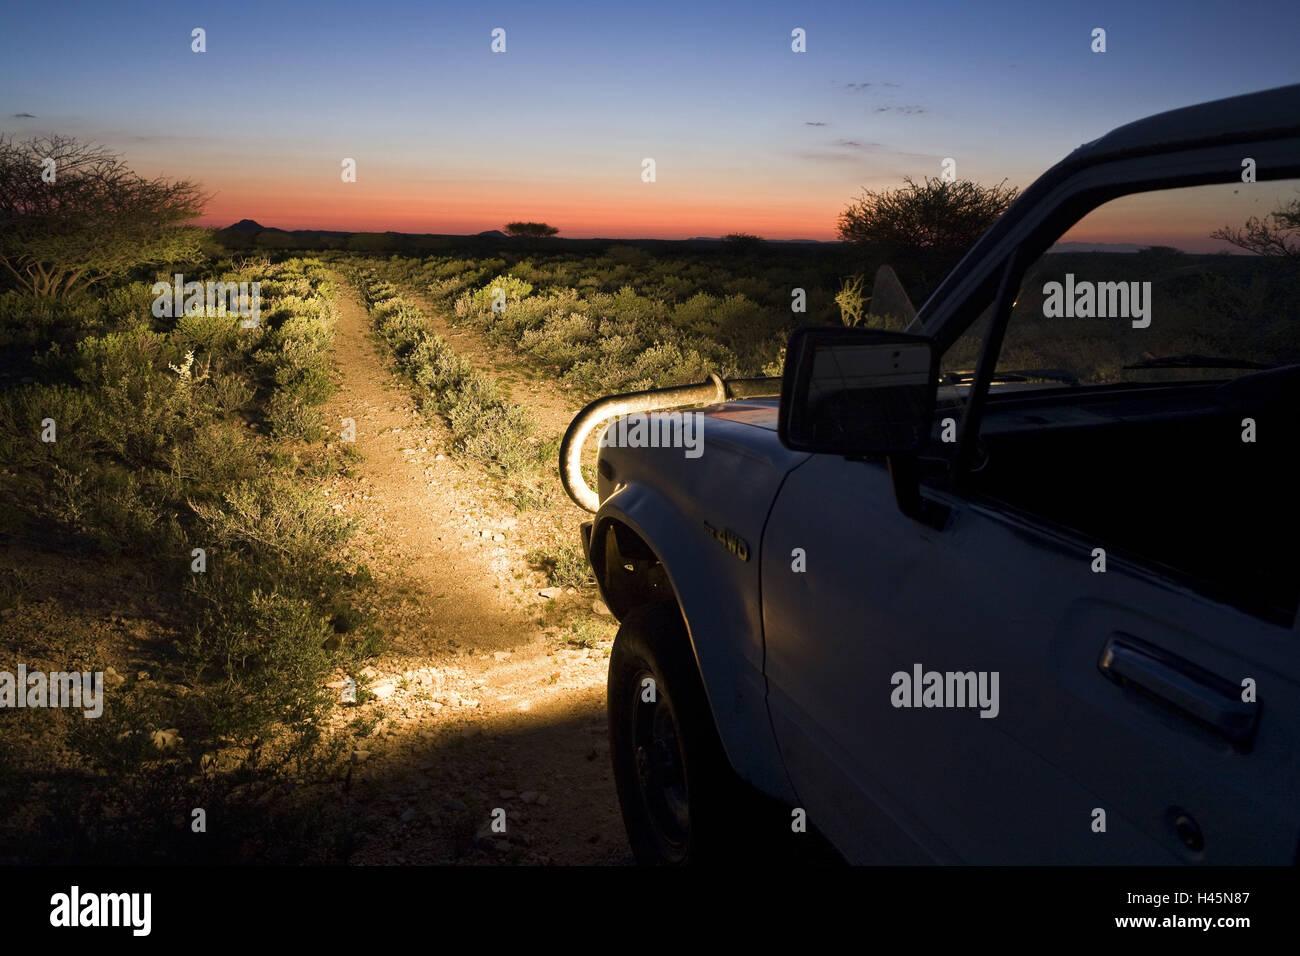 Africa, Namibia, Omaruru, savanna, offroad tour, jeep, evening, - Stock Image